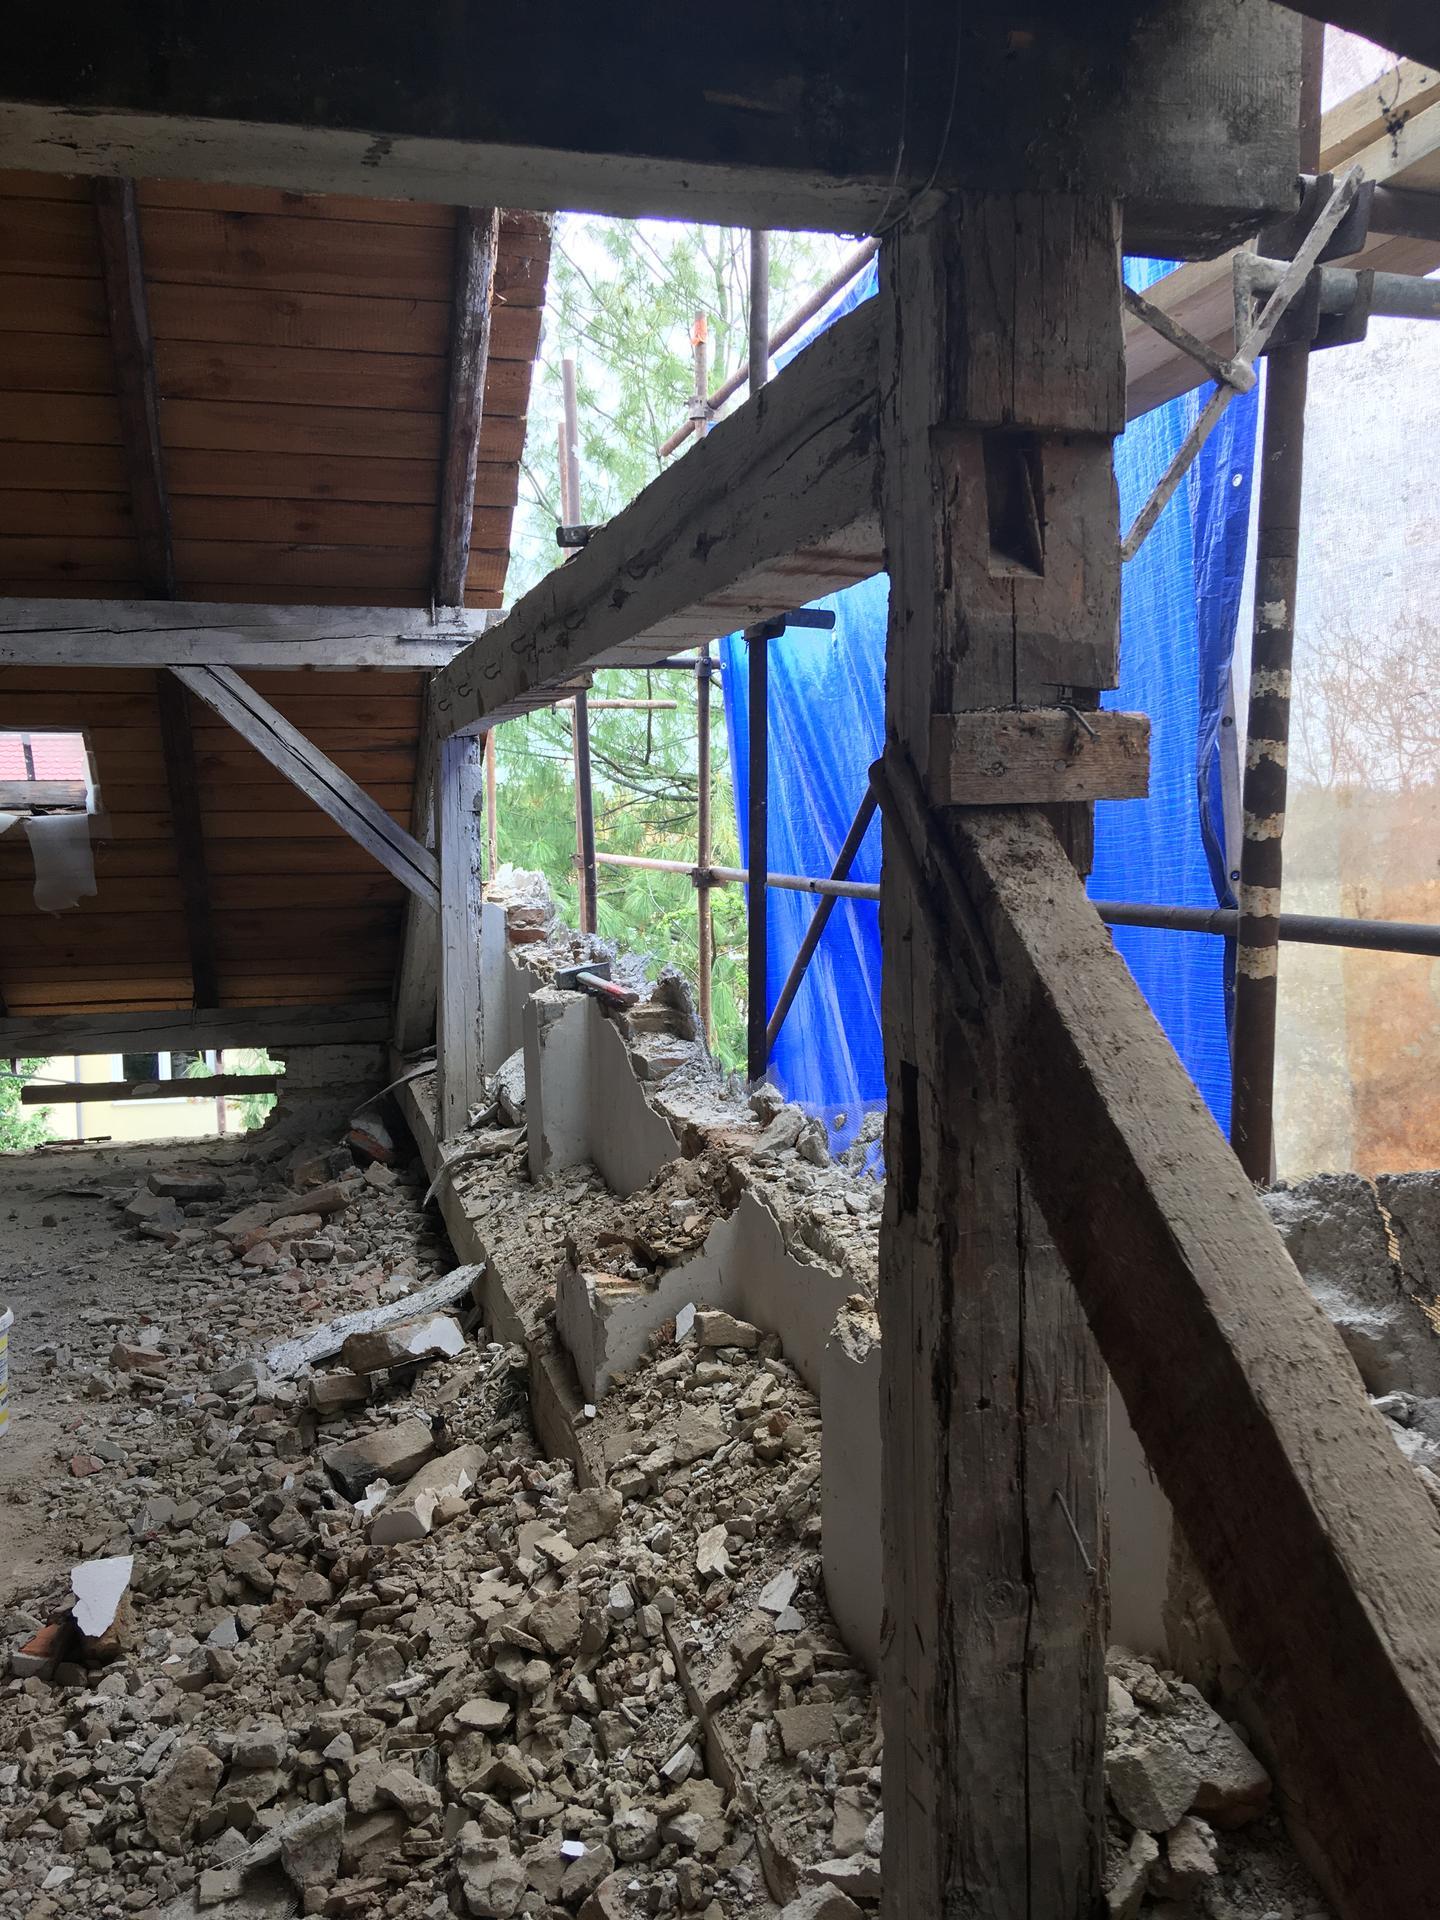 Prestavba podkrovia zo sedlovo valbovej na sedlovú strechu. - Obrázok č. 55